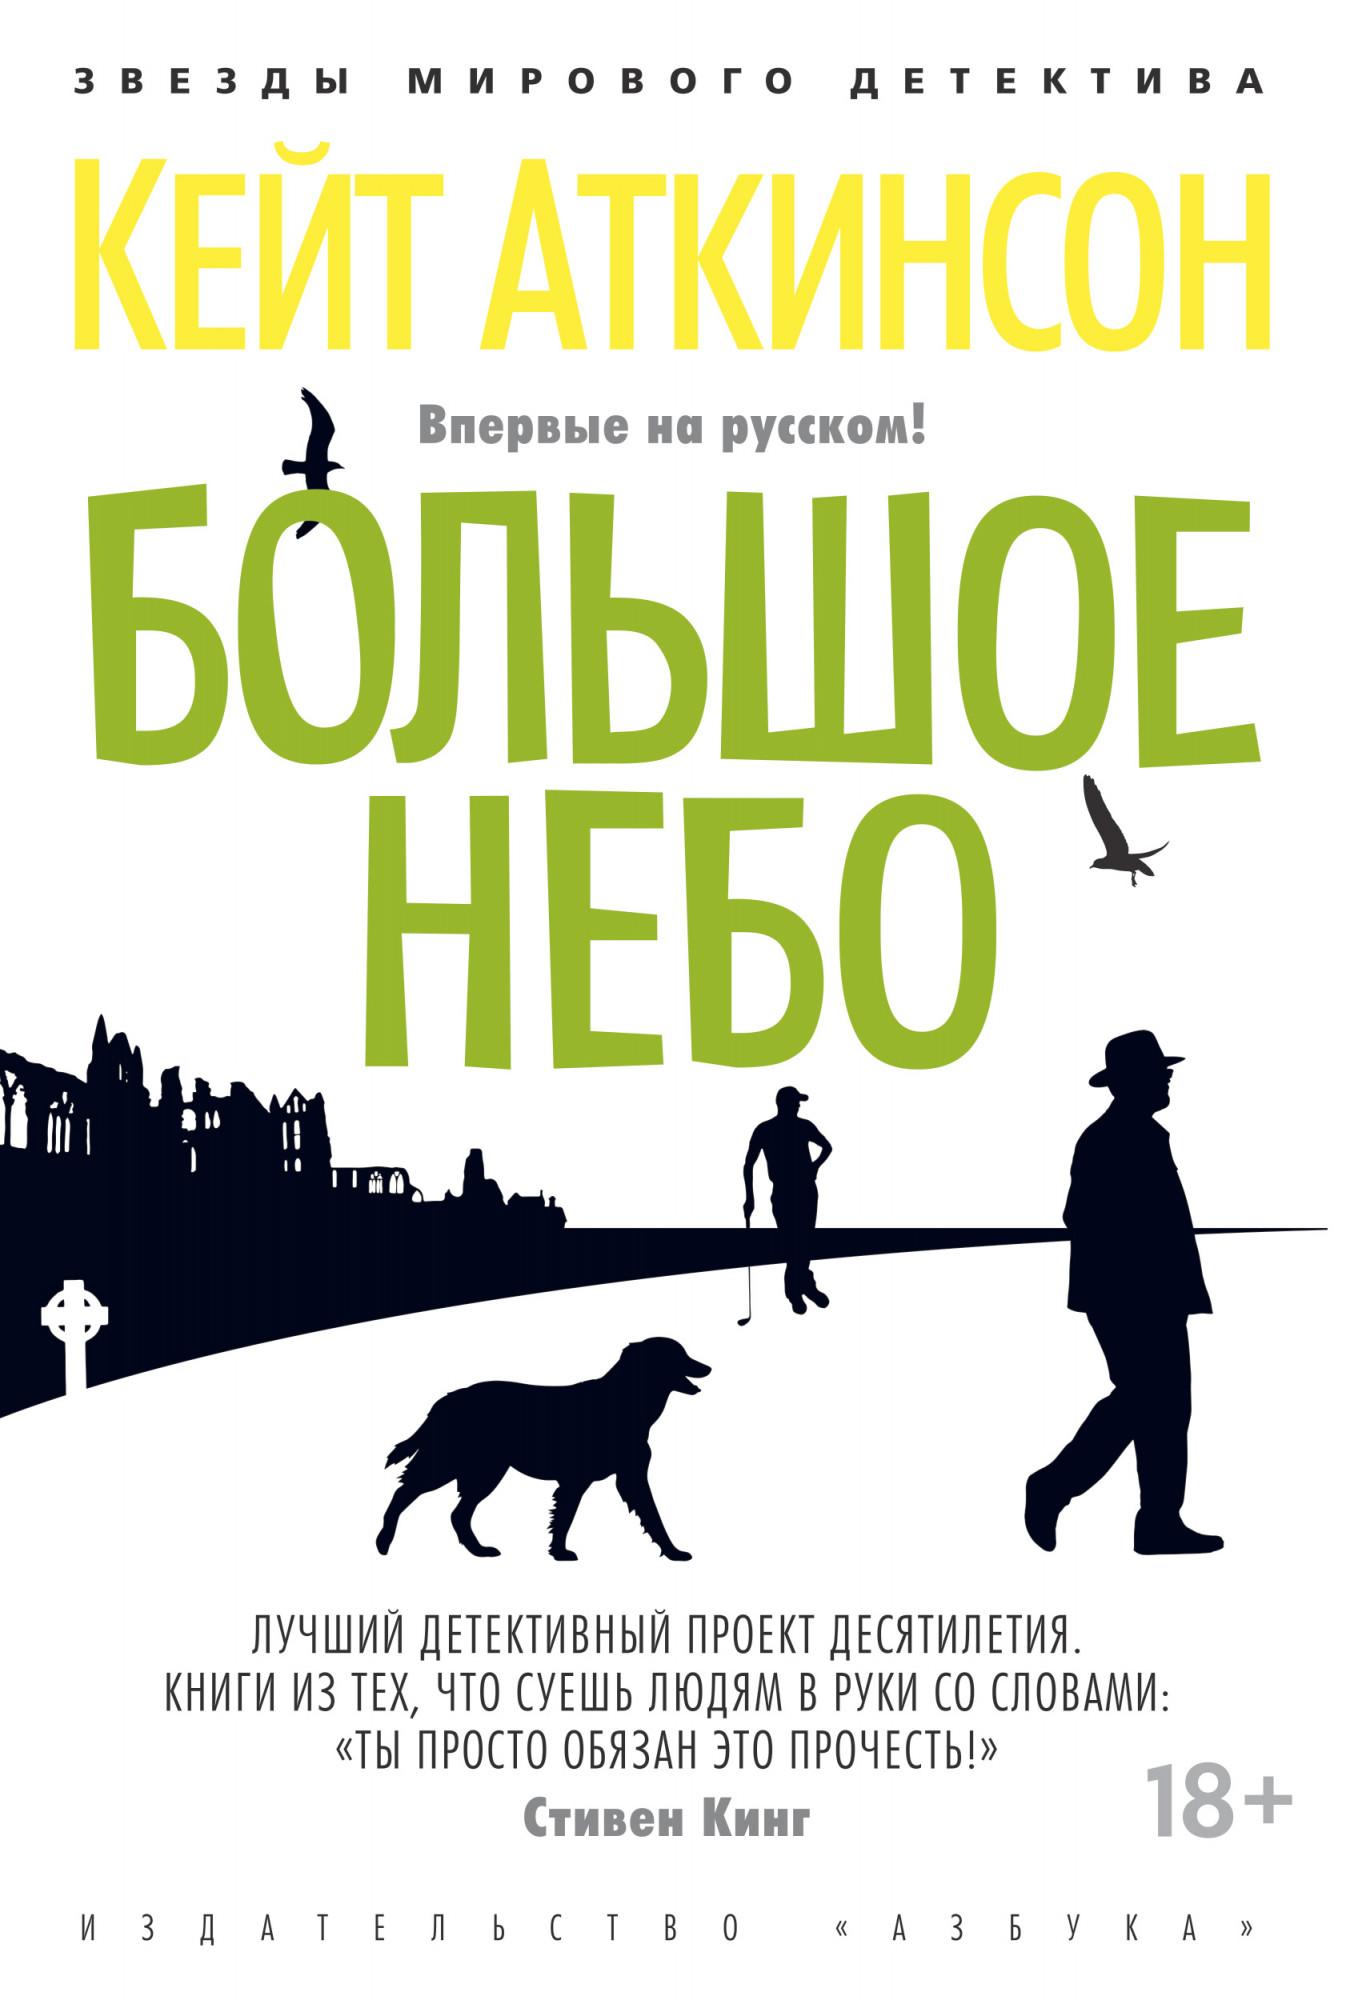 http://chelib.ru/wp-content/uploads/img/books/atkinson-bolshoe-nebo.jpg